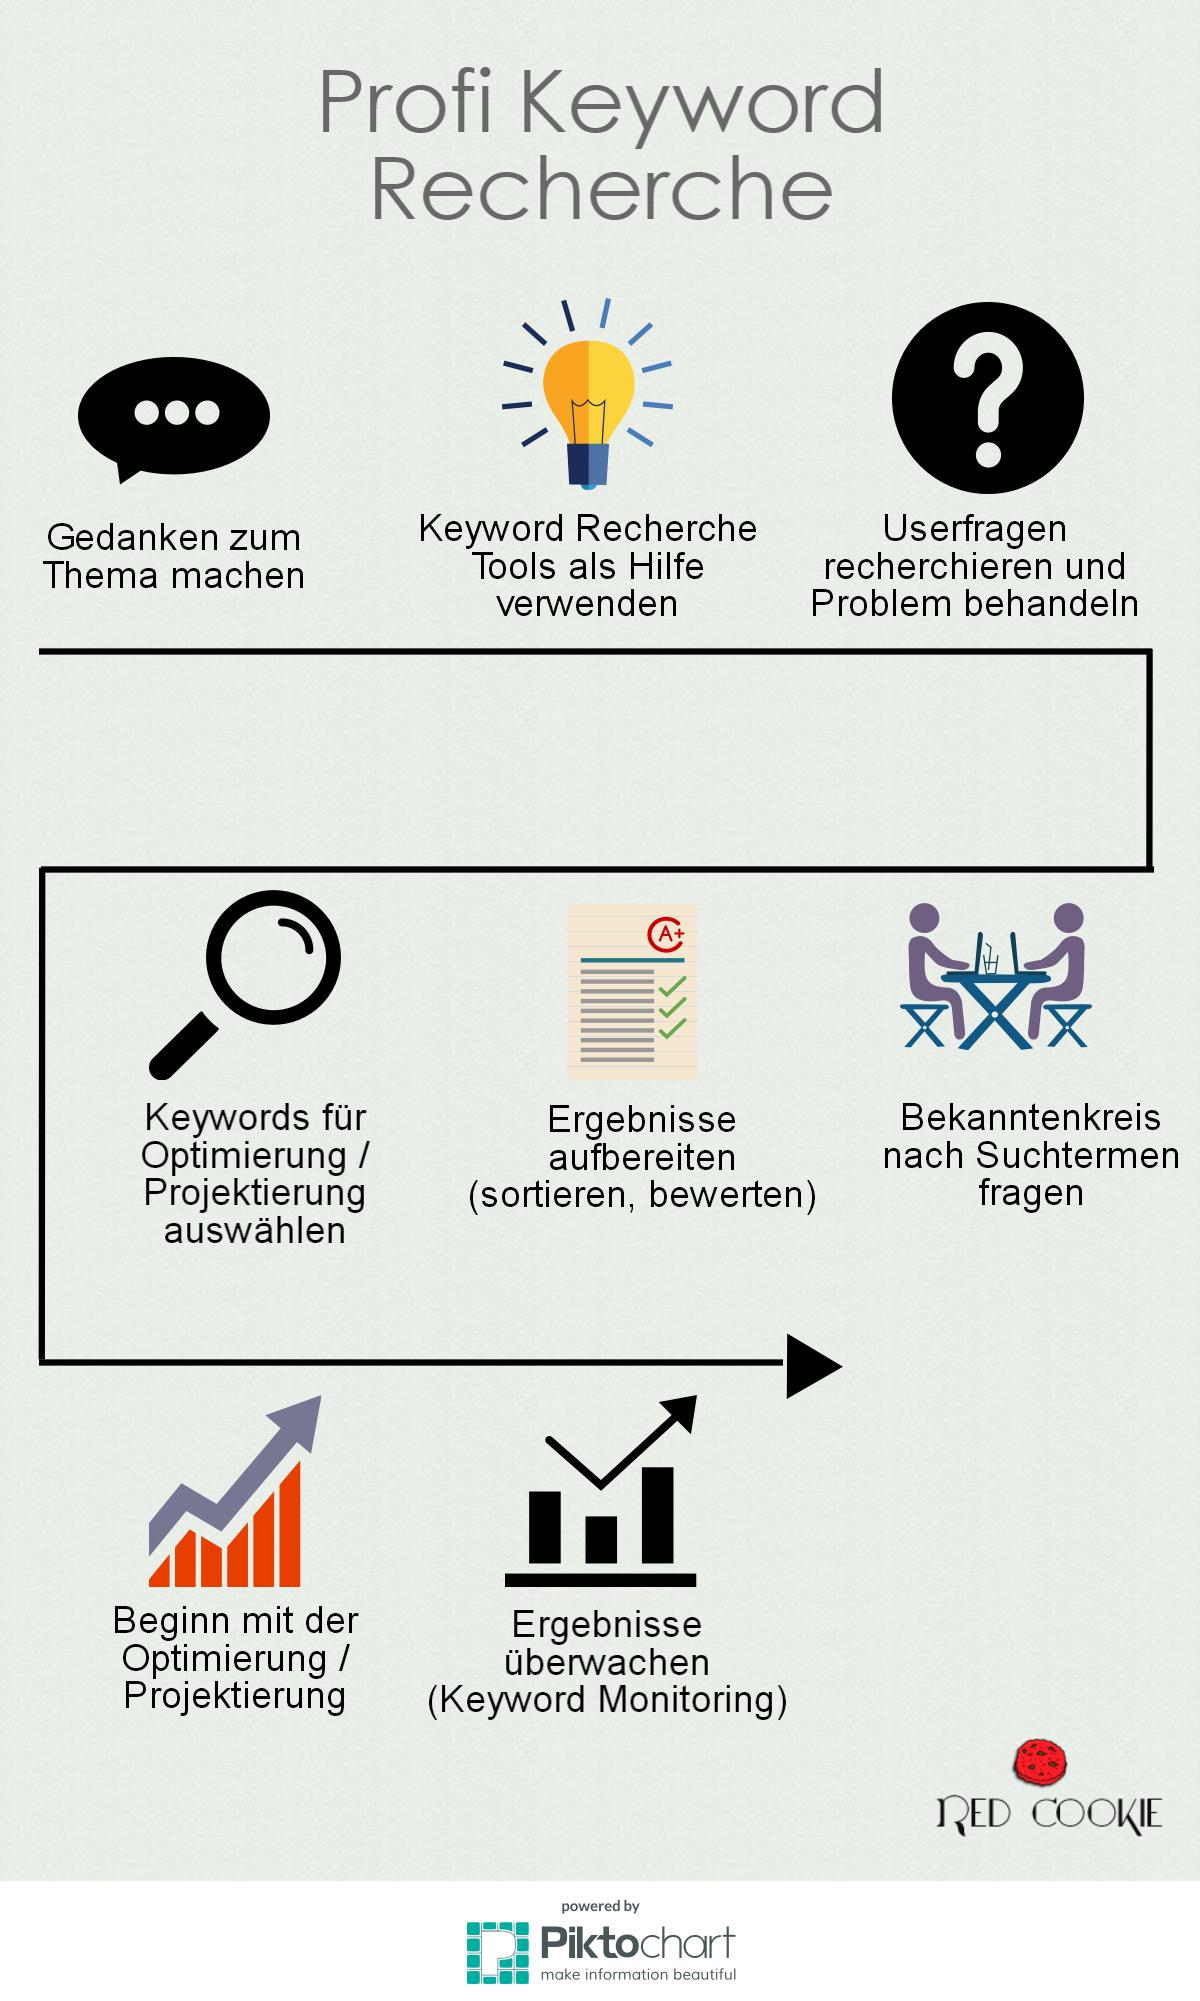 Übersichtsgrafik Profi-Keyword-Recherche